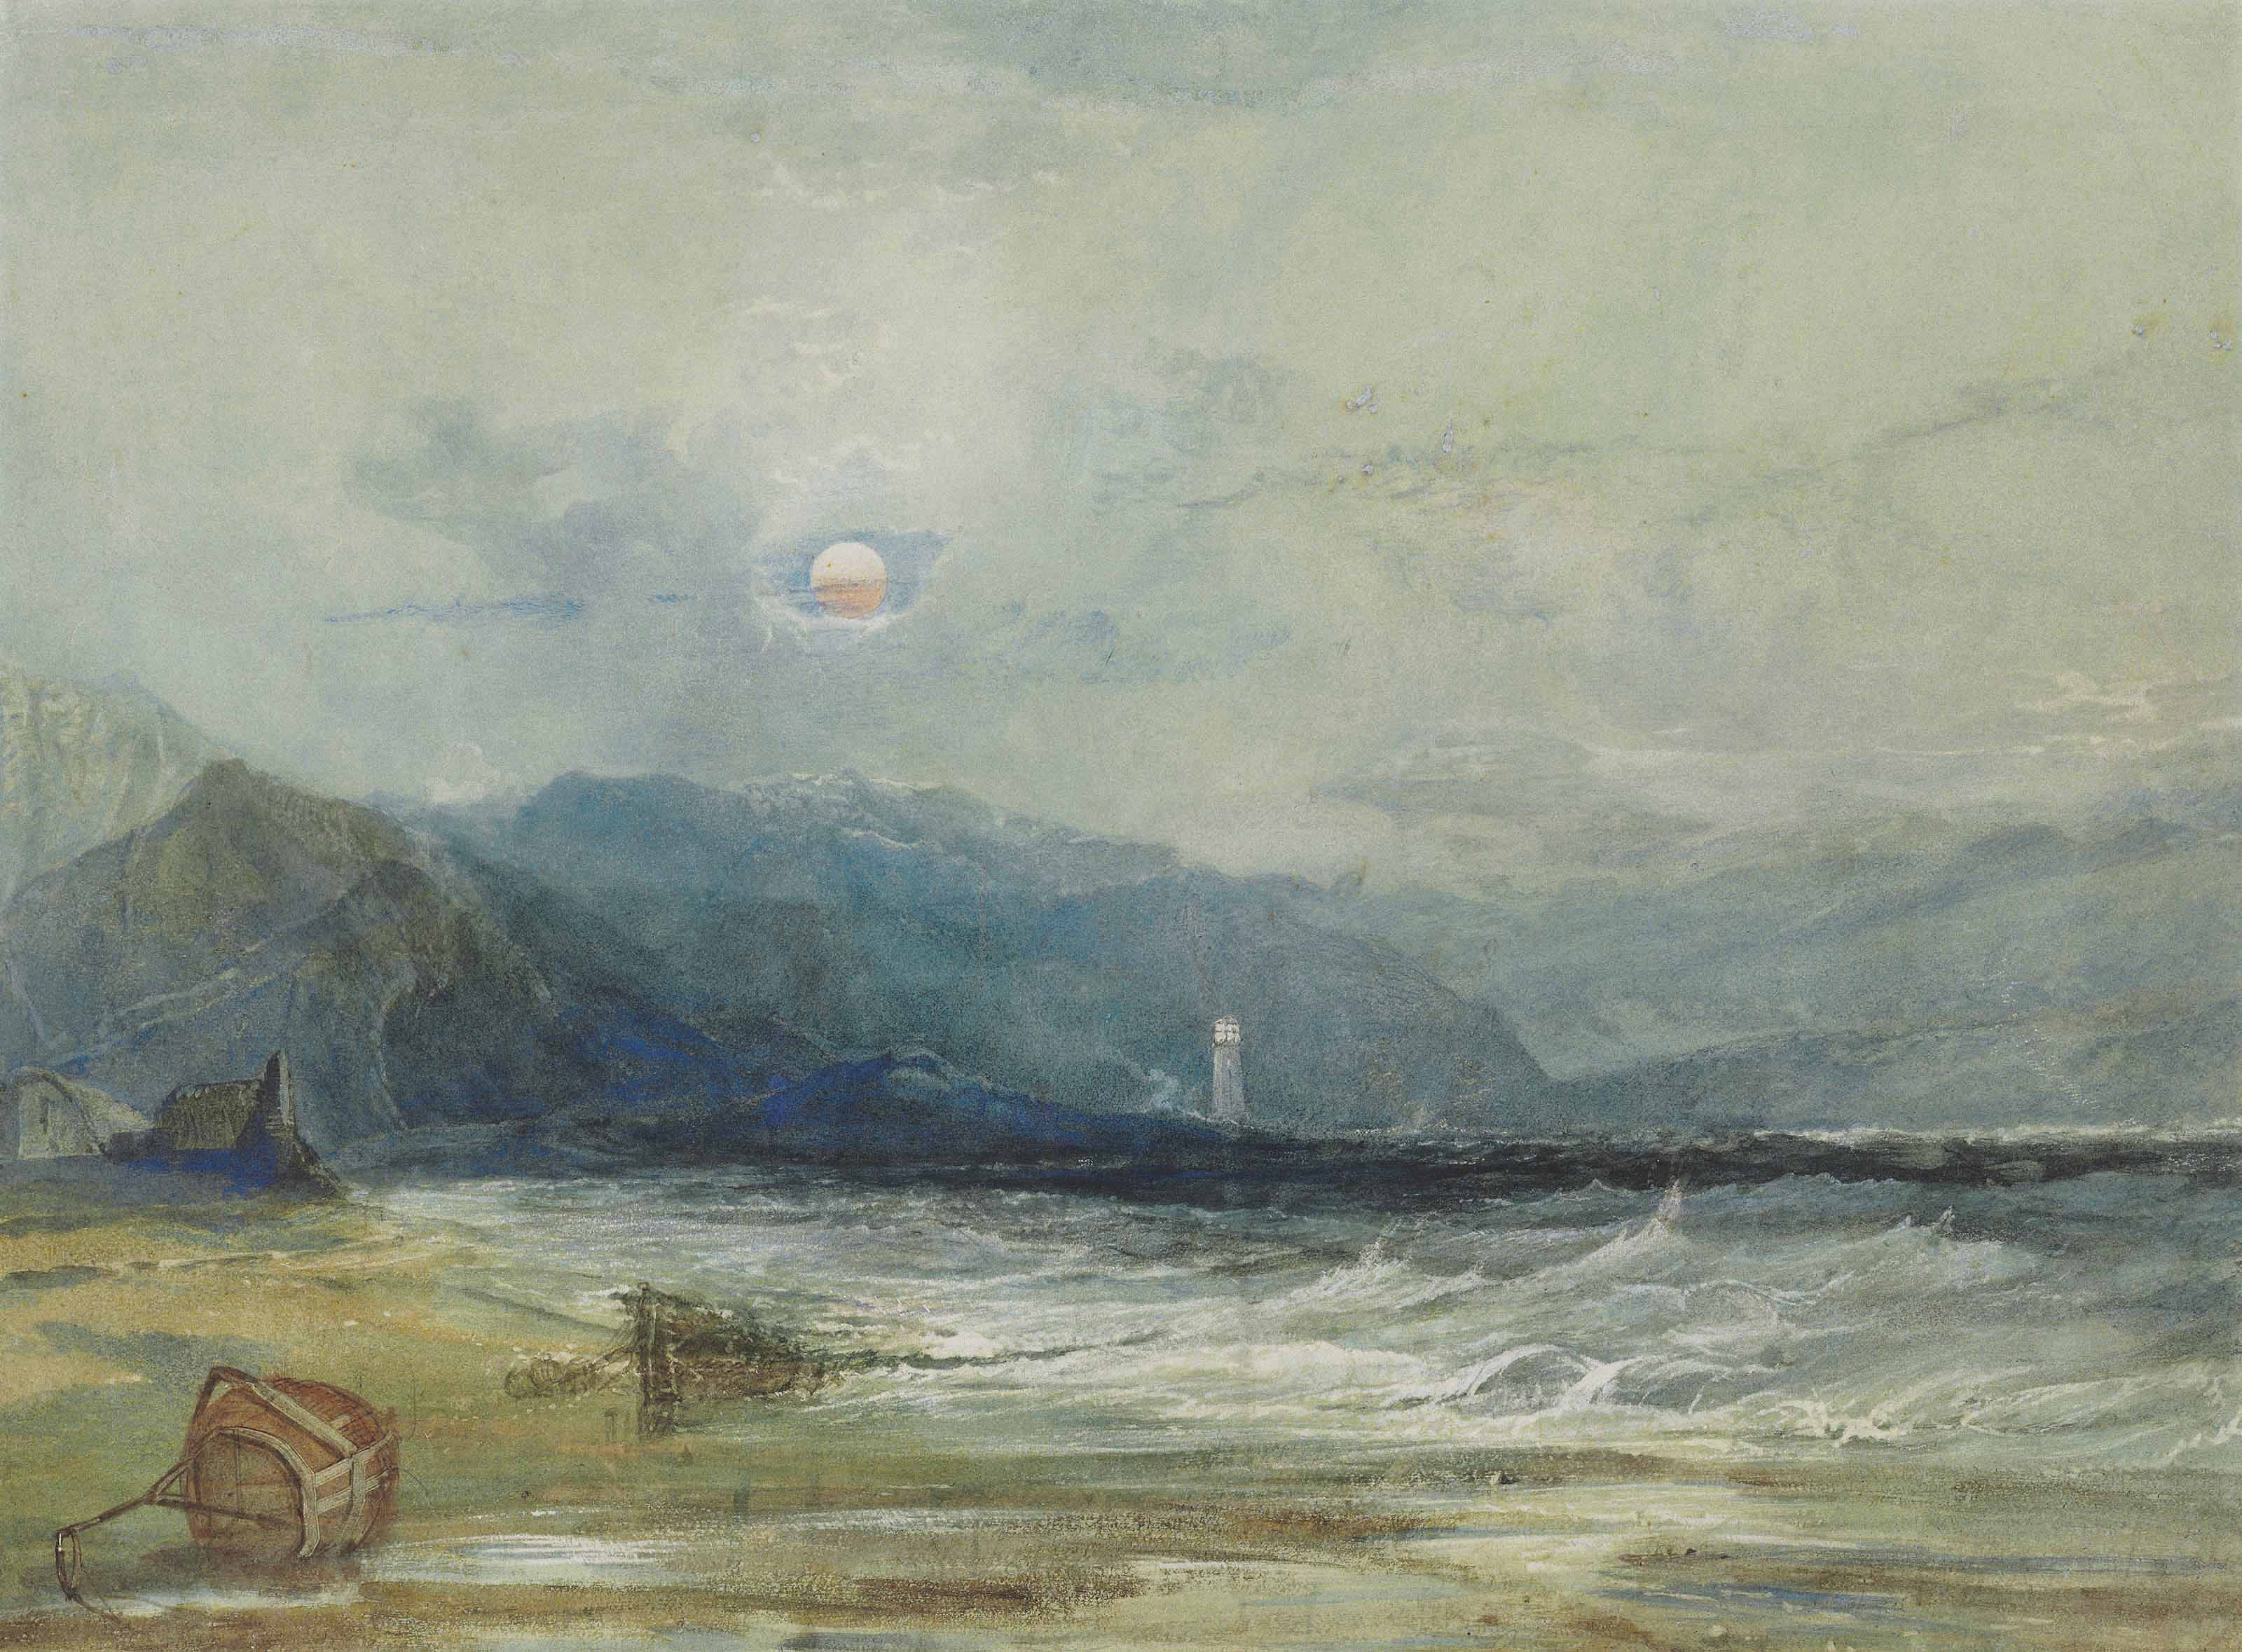 A lighthouse seen across a bay